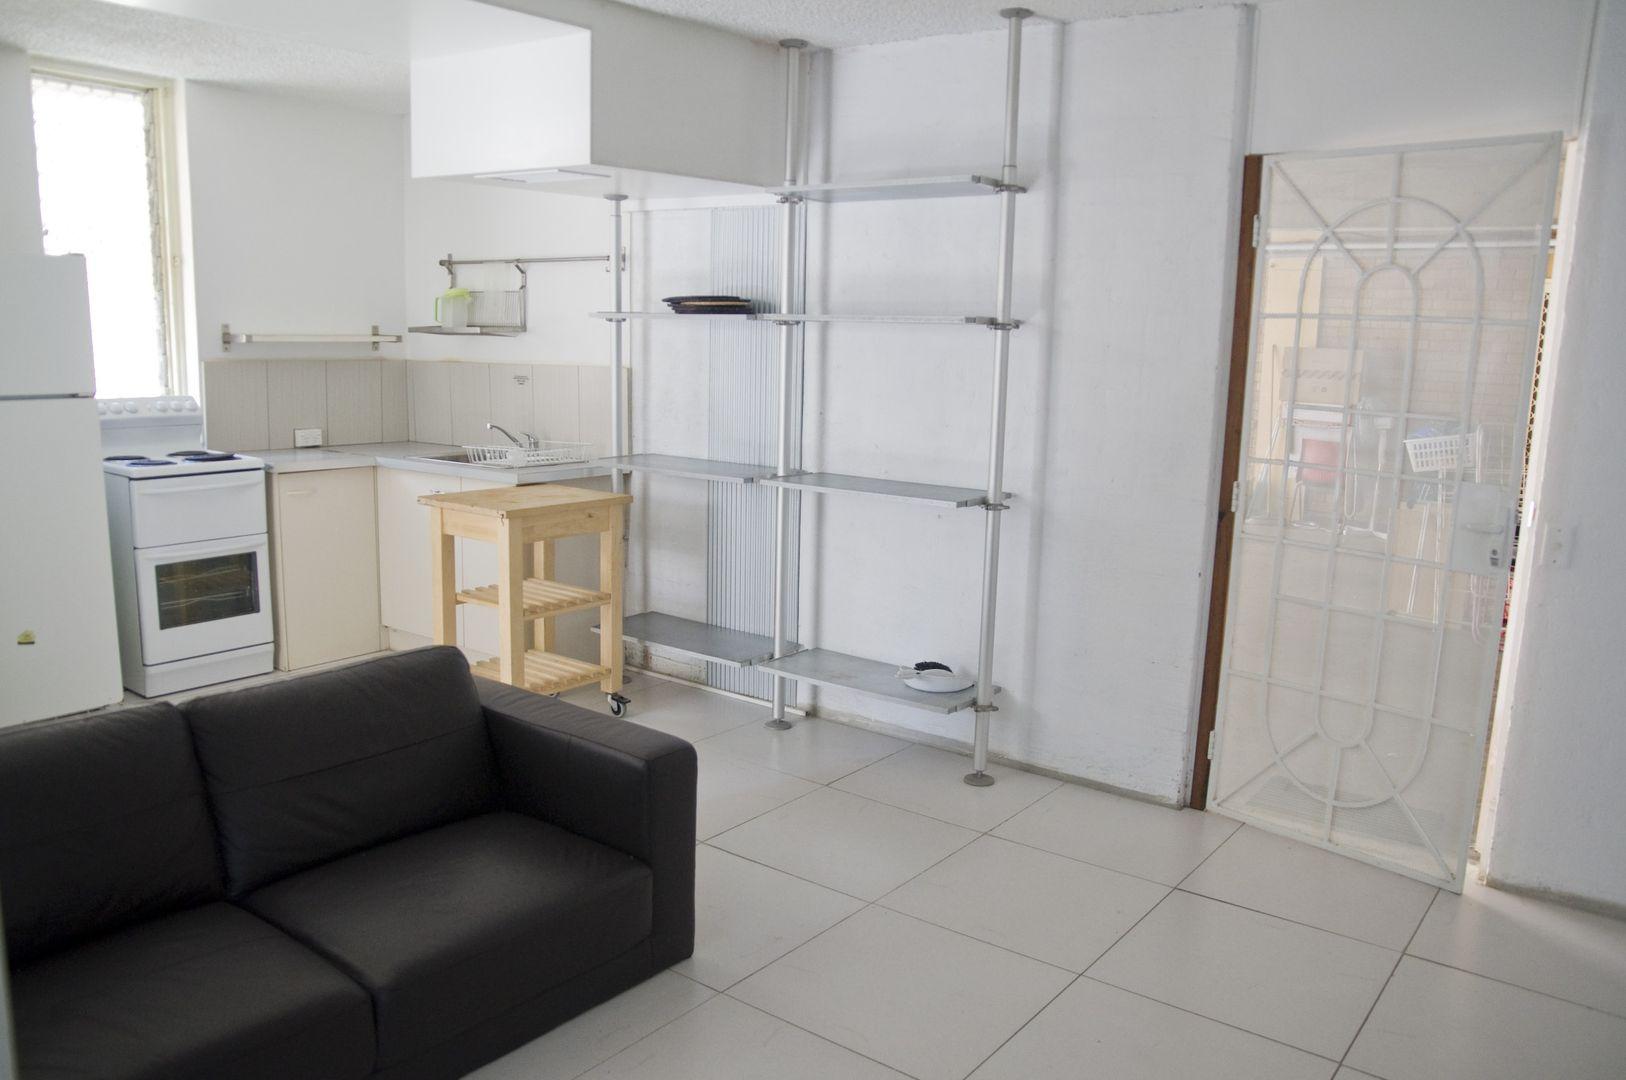 7/59 Sandford Street, St Lucia QLD 4067, Image 2